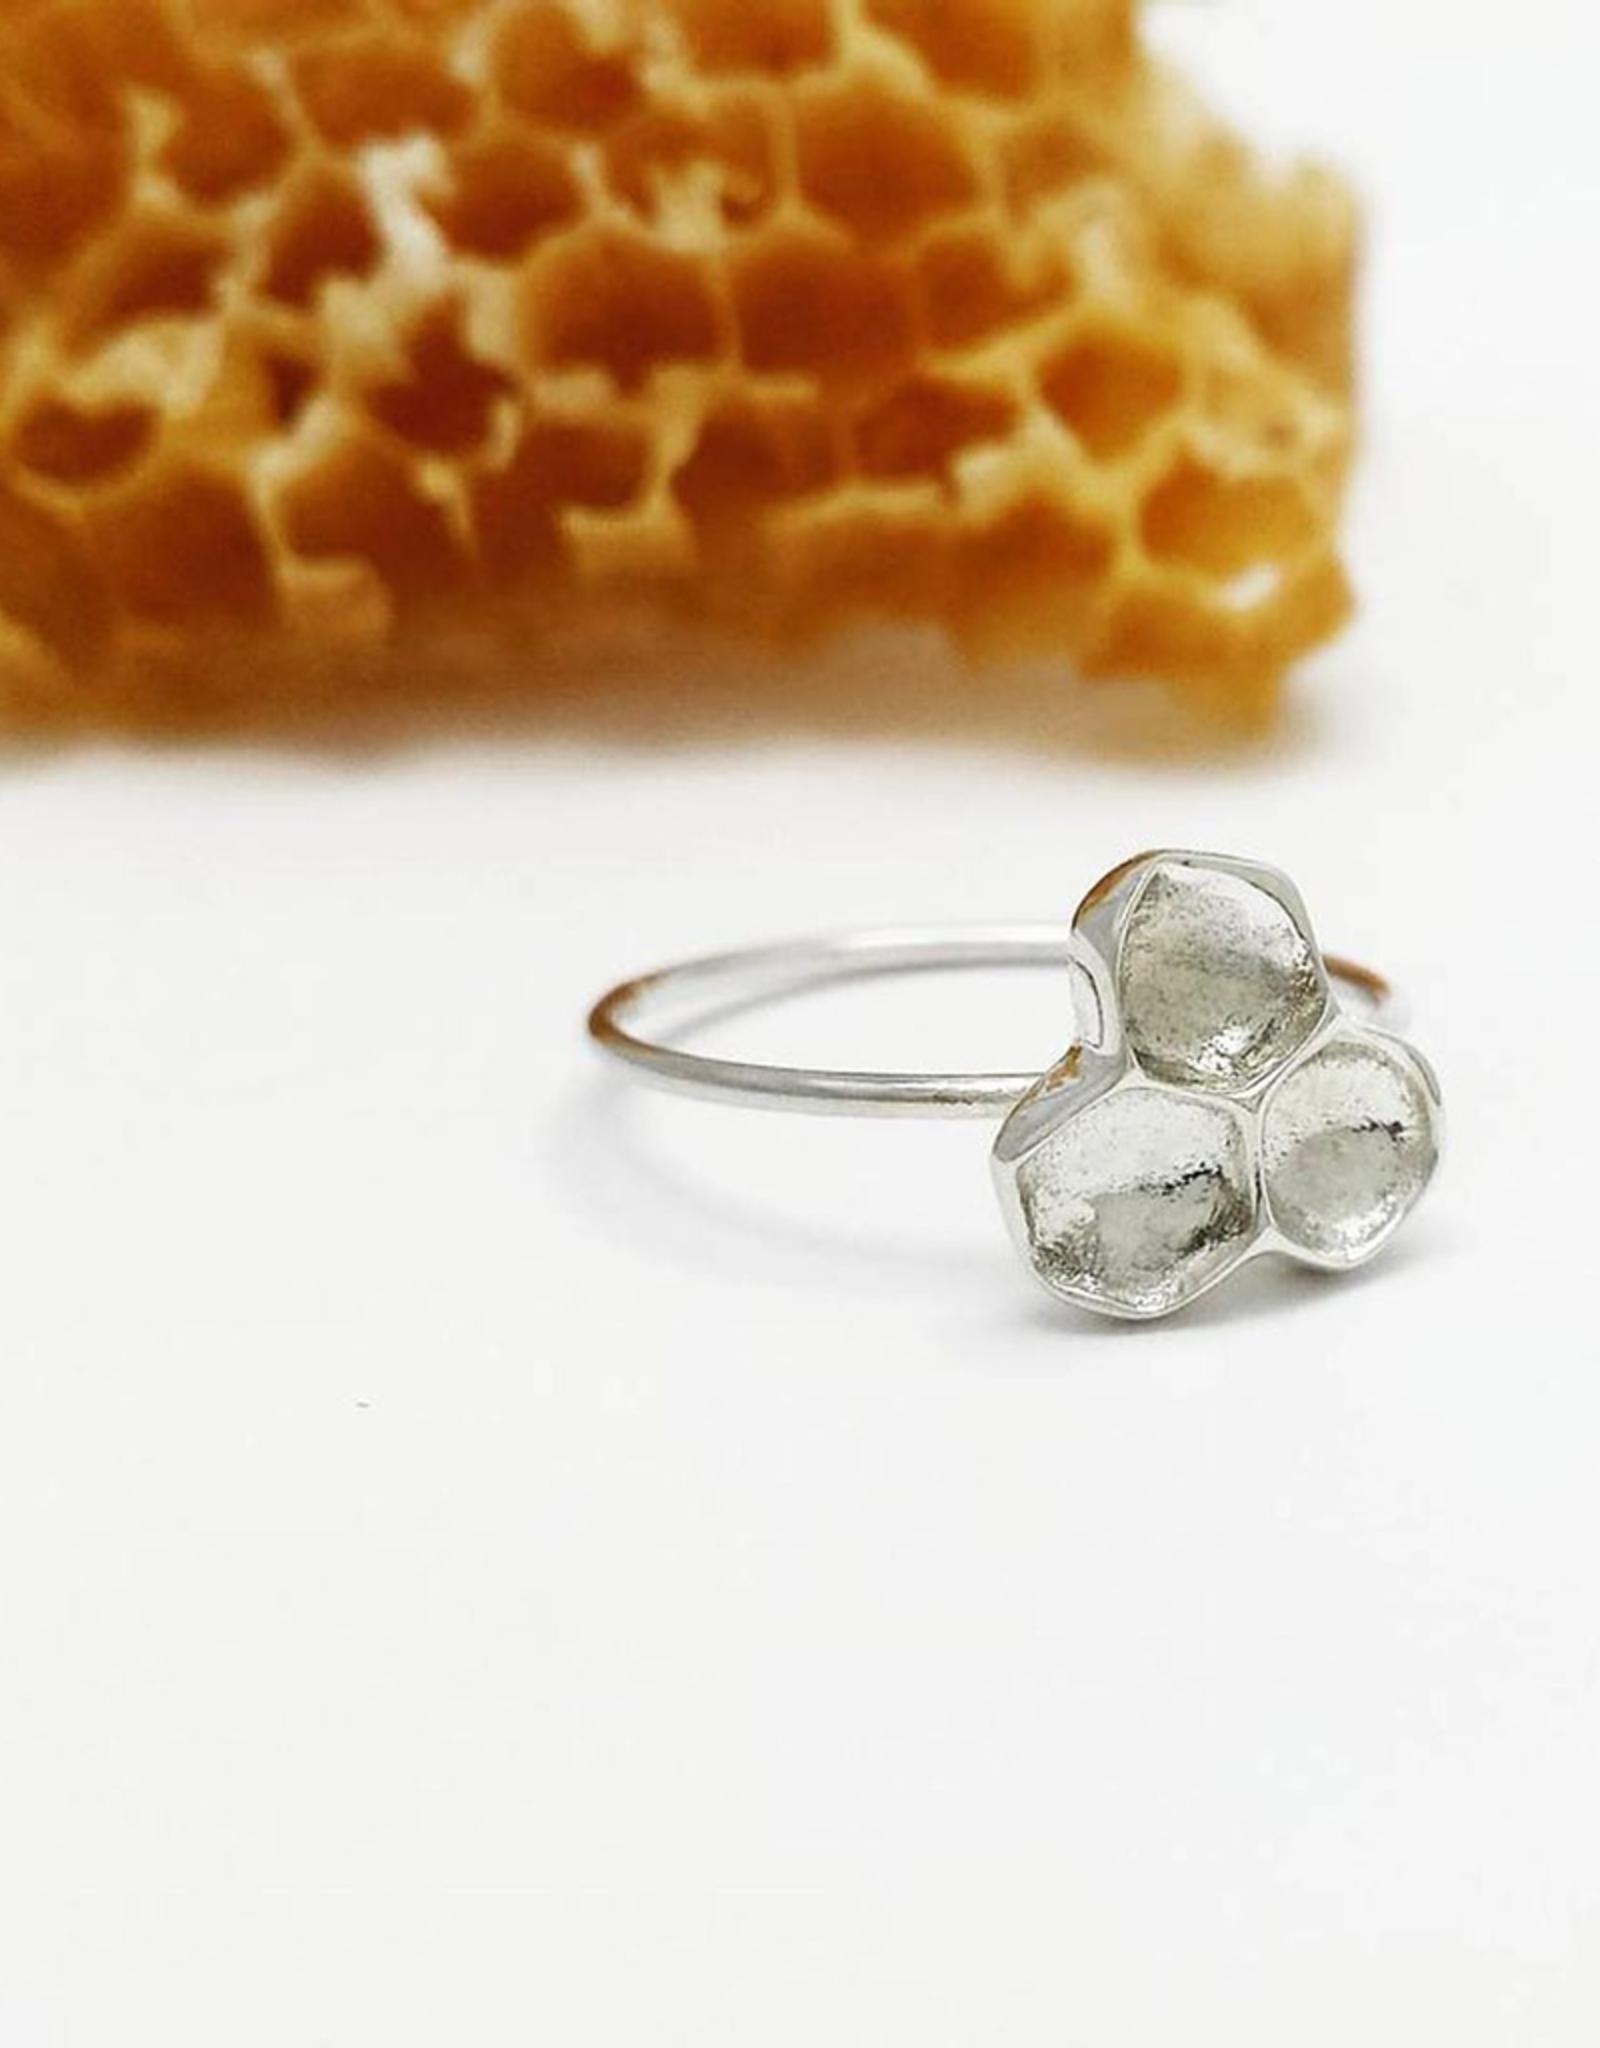 Handmade Honeycomb Ring - Sterling Silver